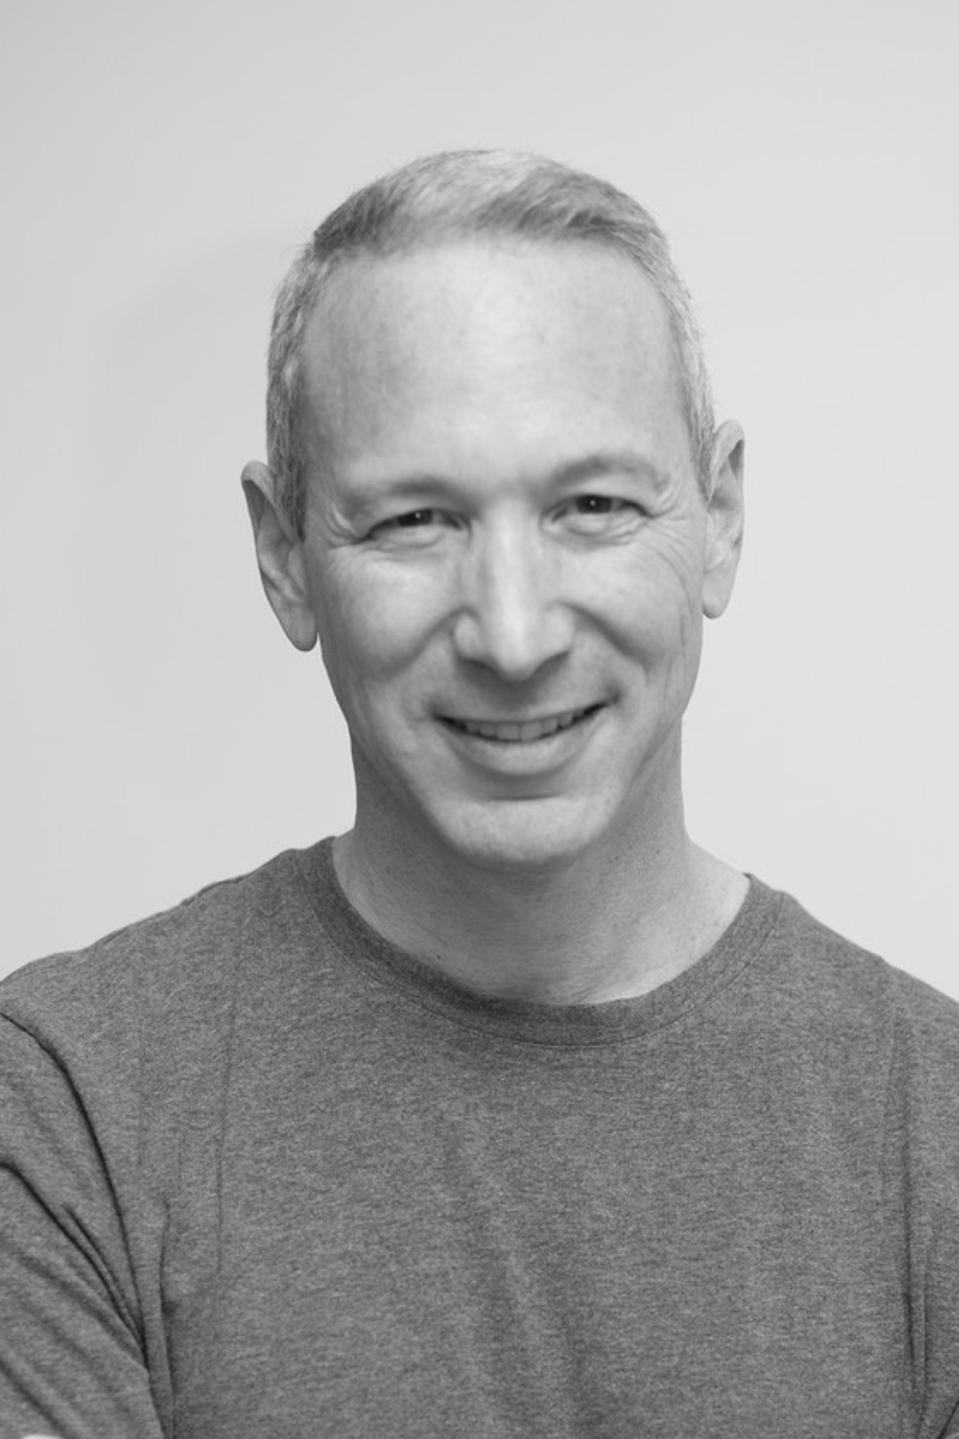 Daniel Schreiber, cofounder and CEO of Lemonade